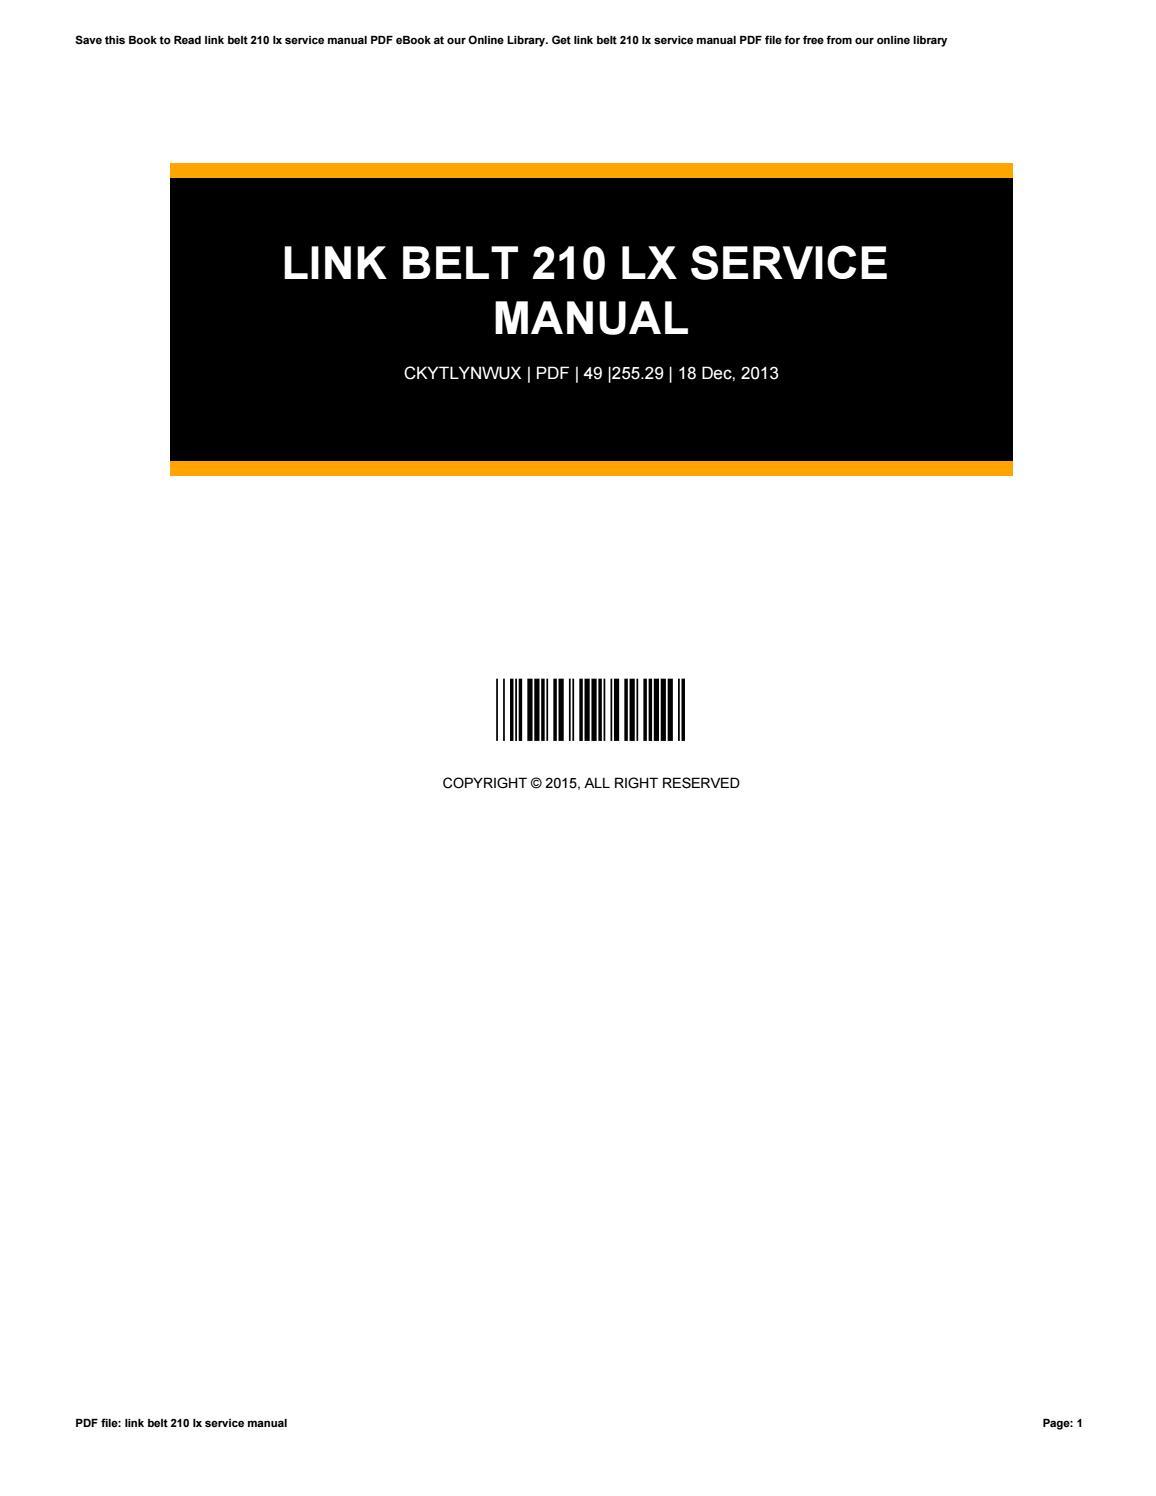 link belt speeder ls 85 drag link crane shovel clamshell trench hoe photo overhaul service manual